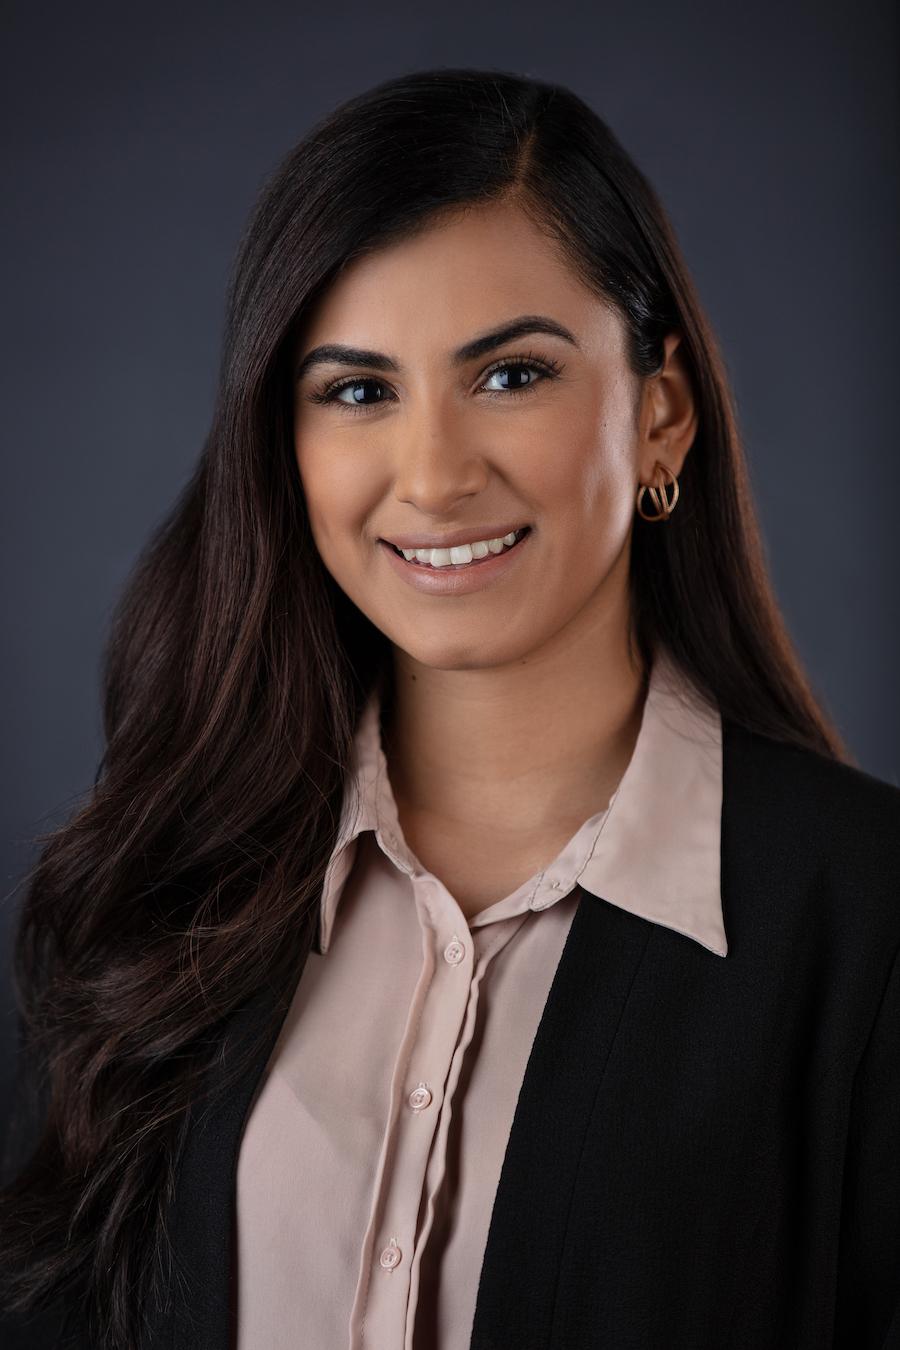 Beverly R. Carvajal Human Resources manager